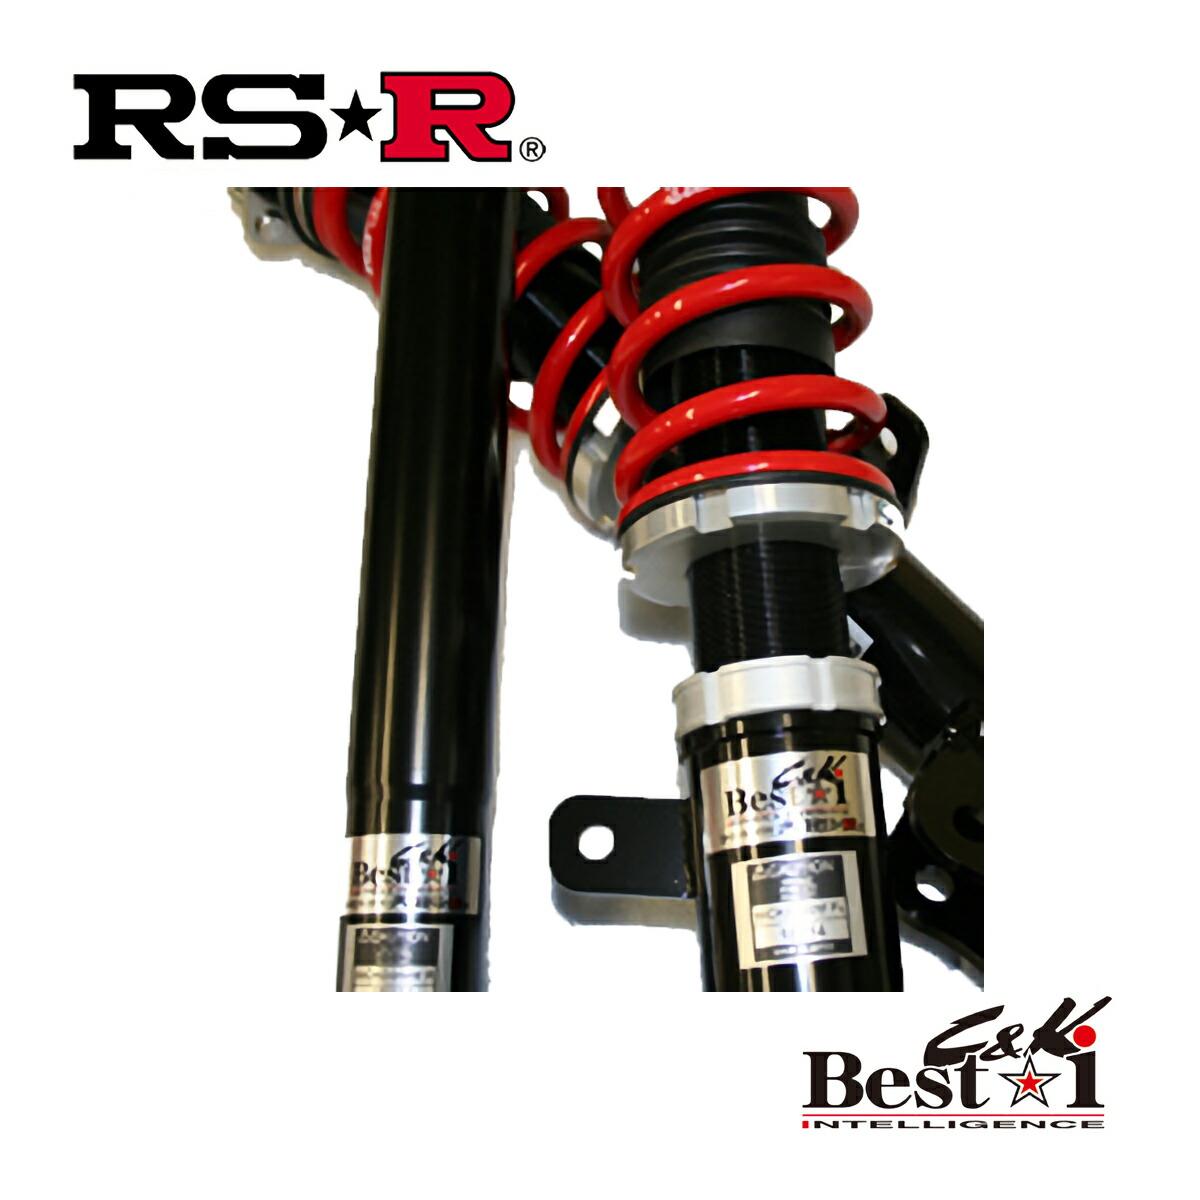 RS-R エブリィ エブリイ エブリー ワゴン DA17W PZターボ(ハイルーフ) 車高調 リア車高調整: ネジ式 BICKS655M ベストi C&K RSR 個人宅発送追金有